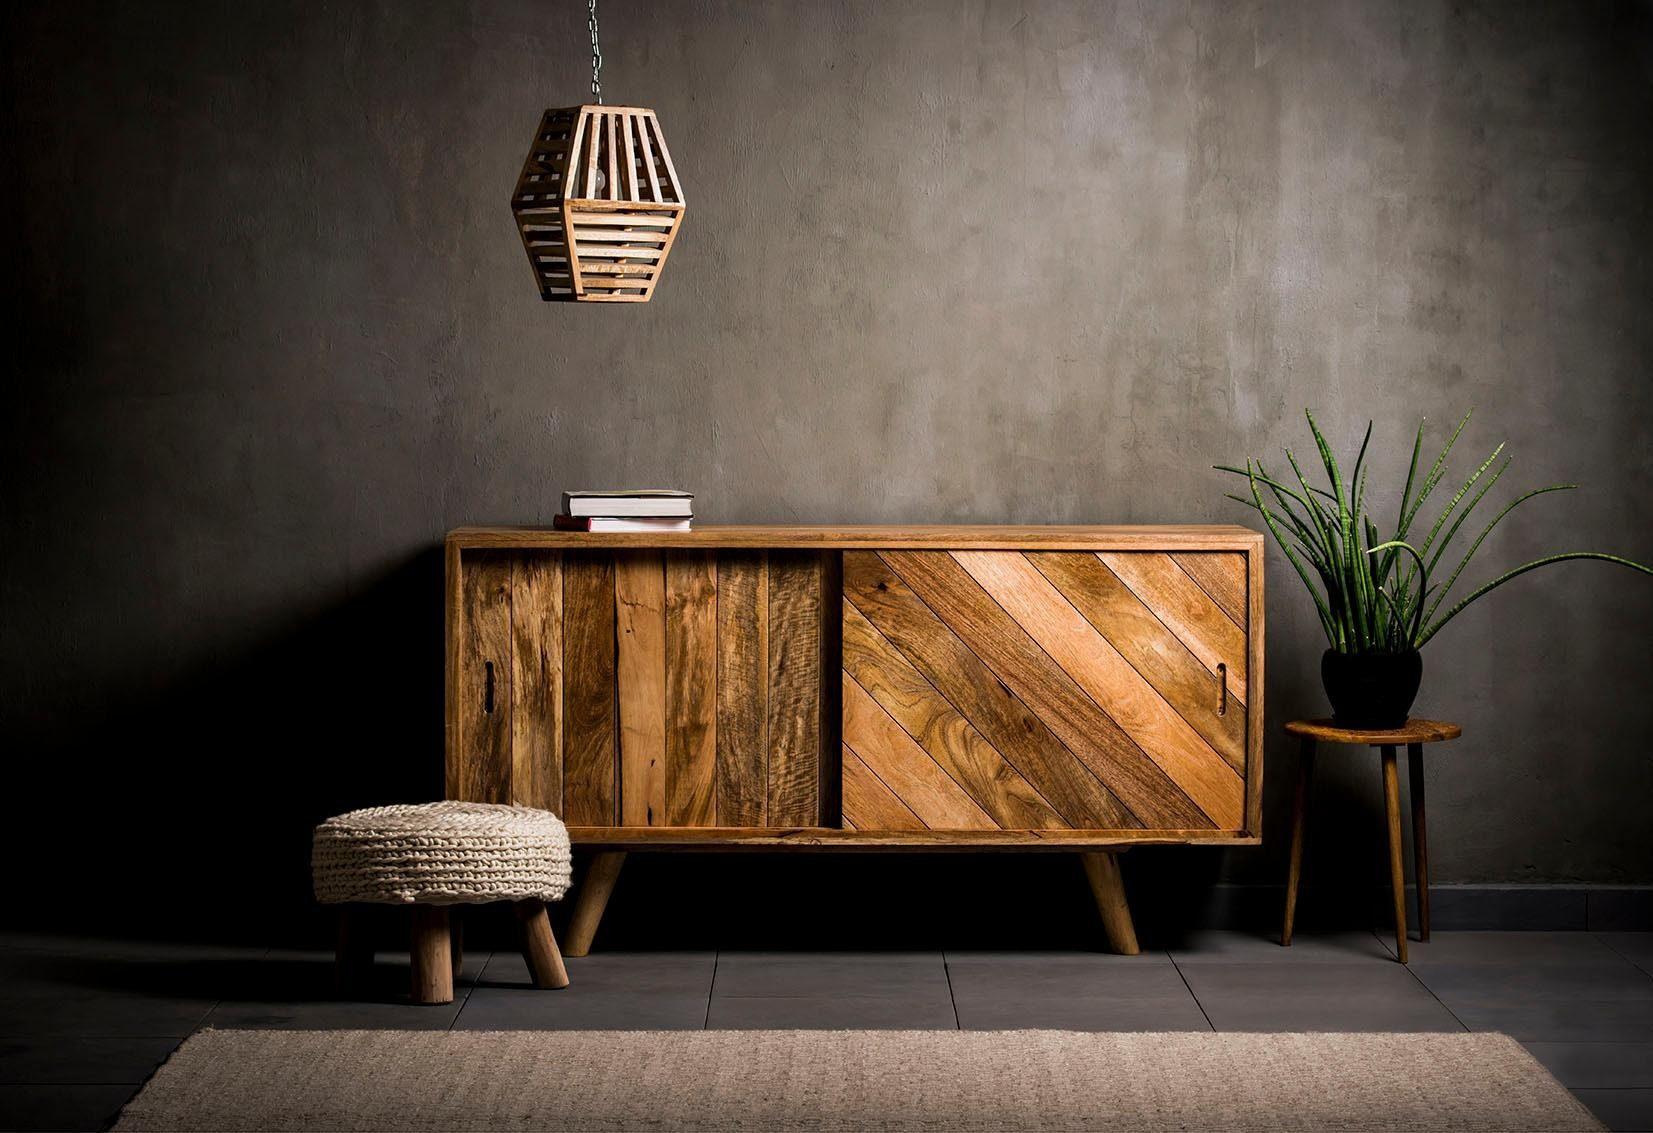 Home affaire Sideboard »Jiaya«, aus massivem Mangoholz, mit 2 Schiebetüren